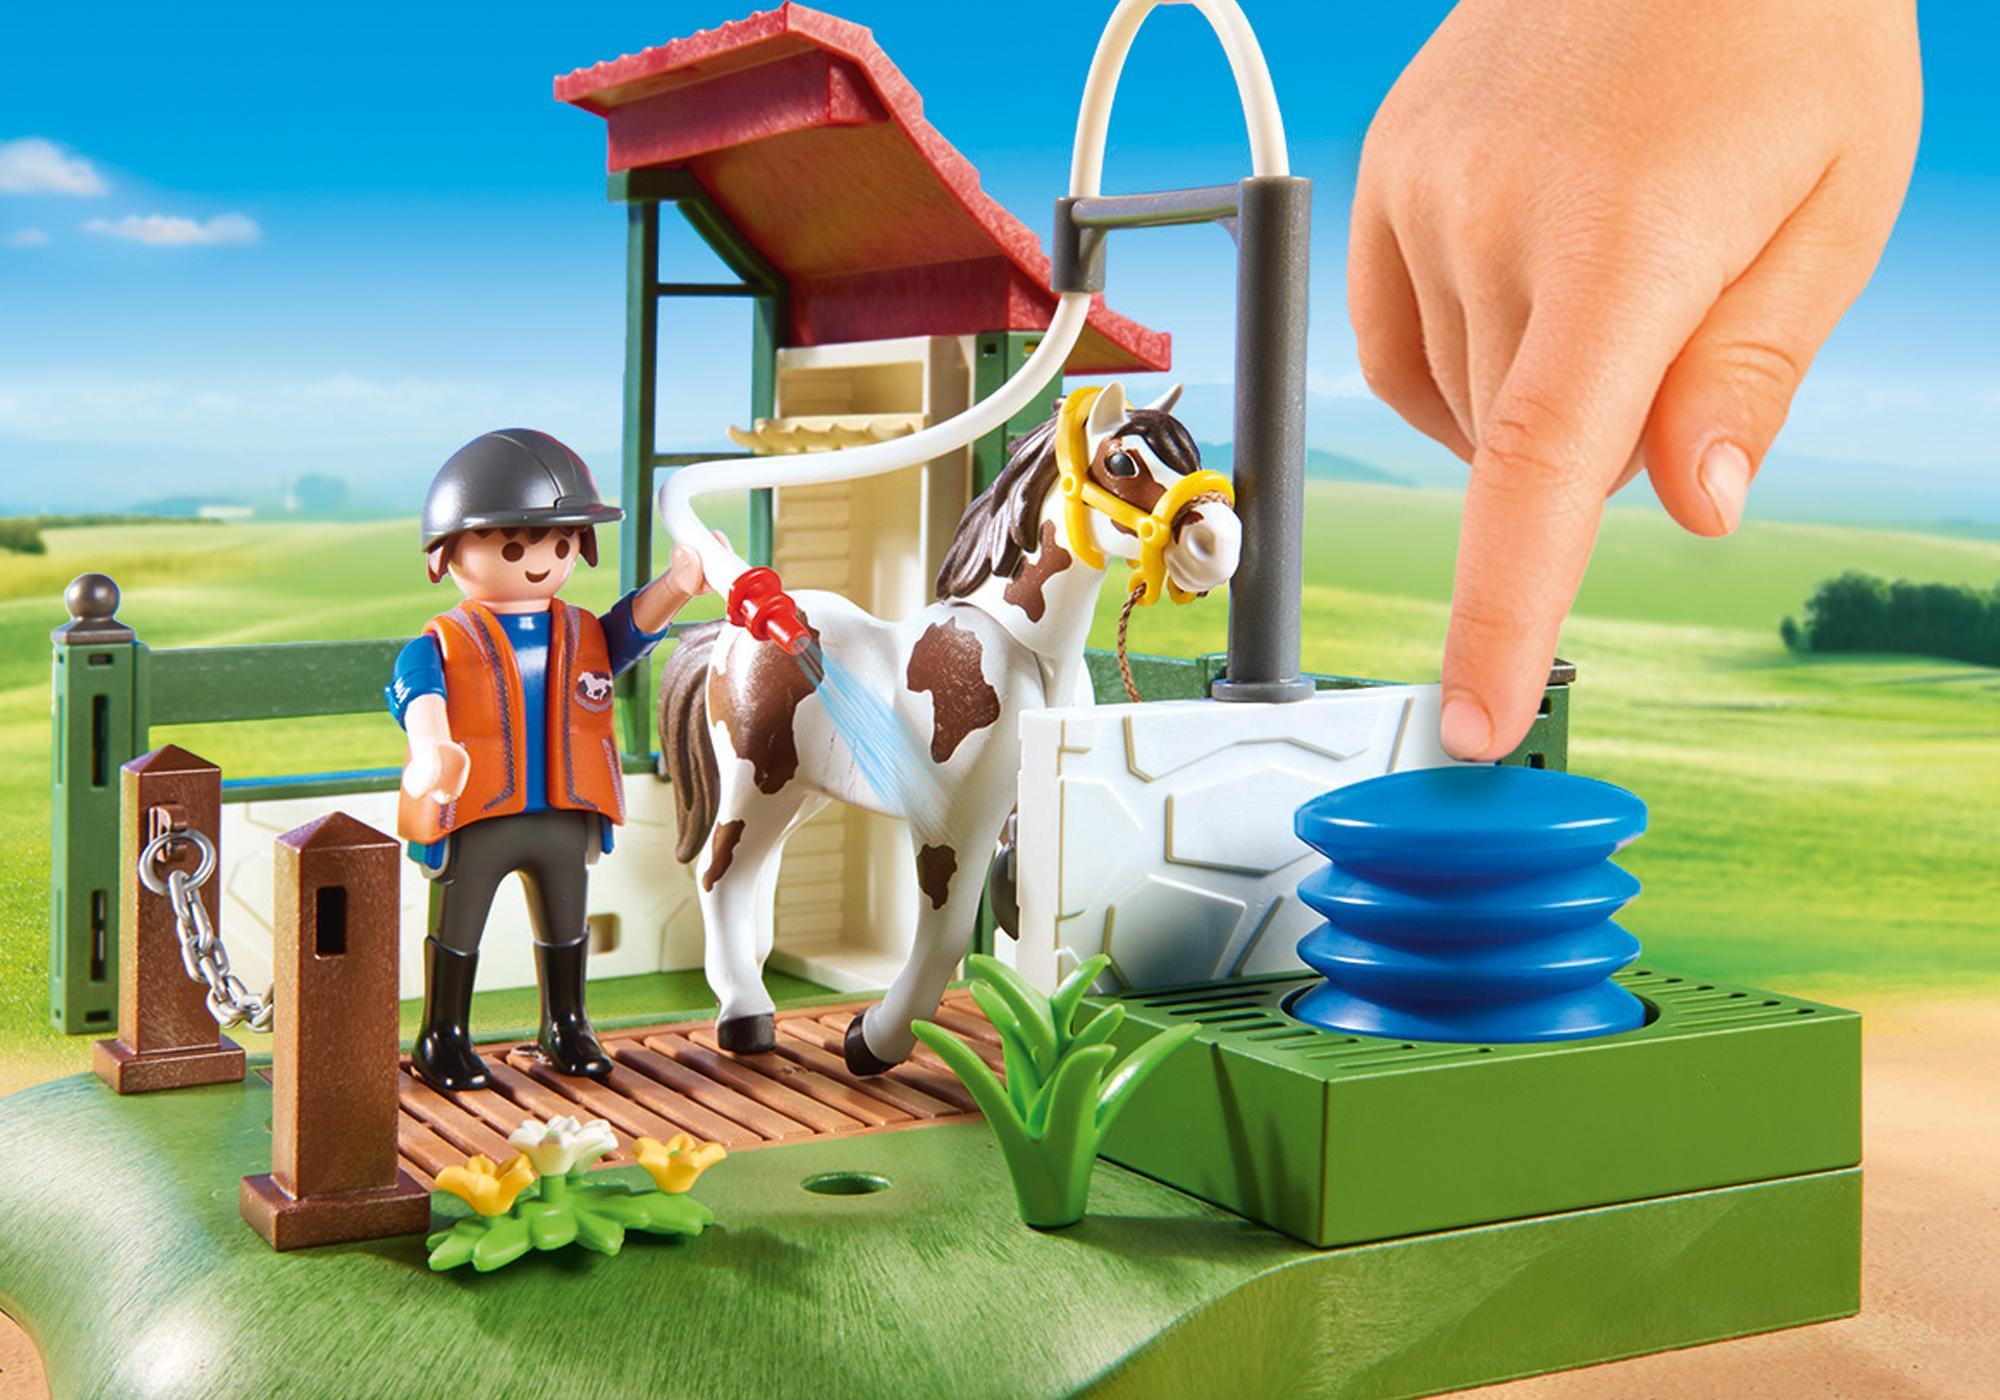 http://media.playmobil.com/i/playmobil/6929_product_extra1/Set de Limpieza para Caballos